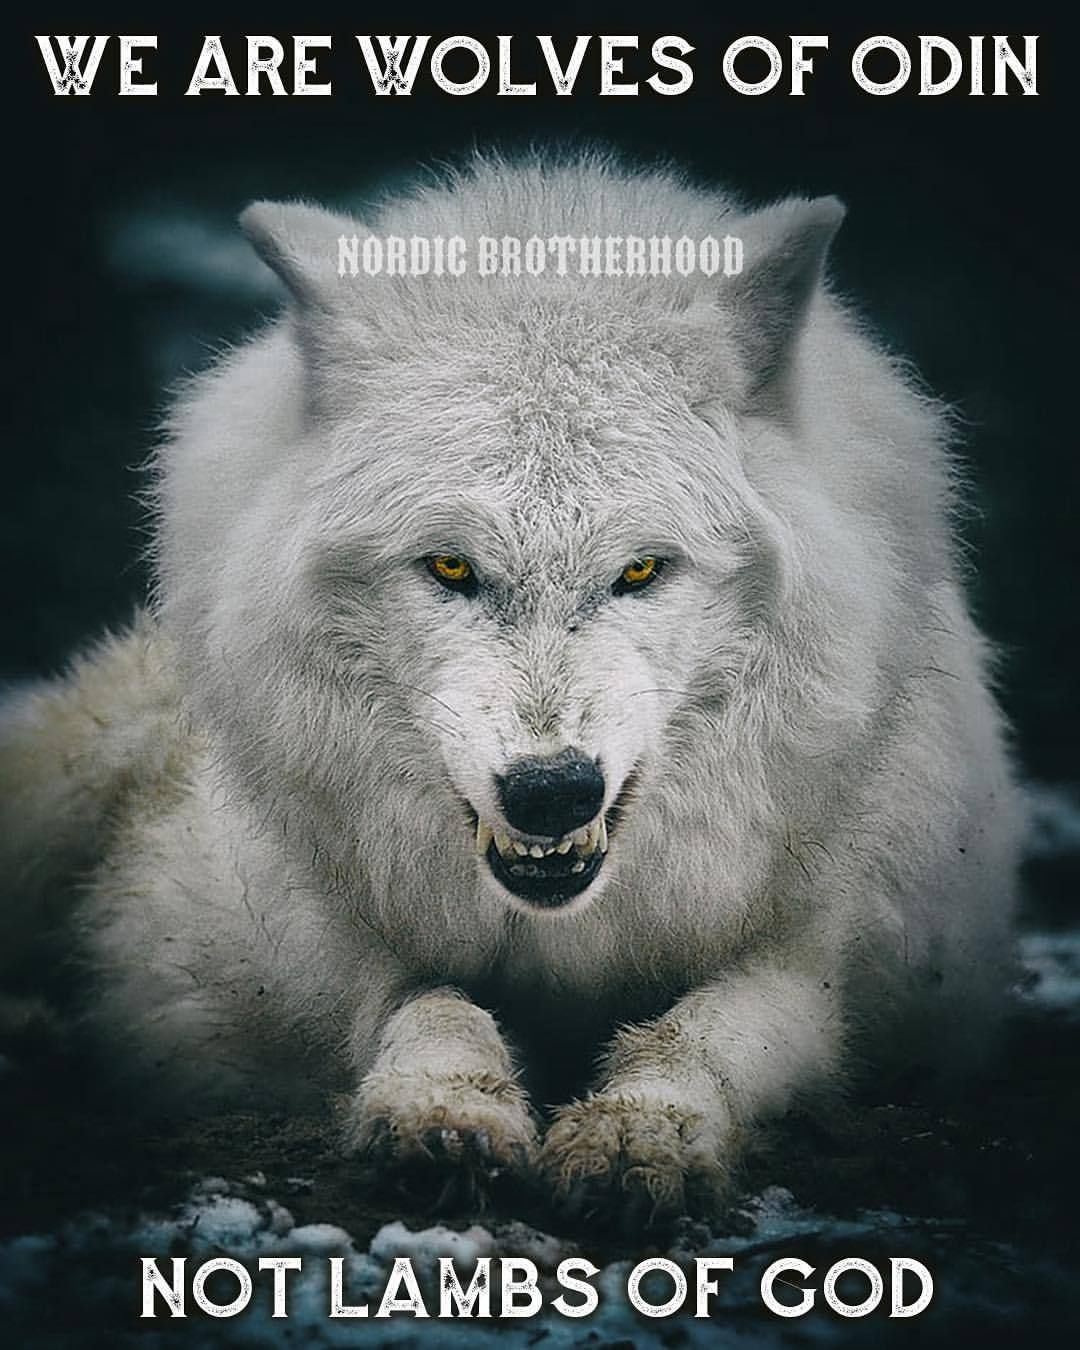 Nordic Brotherhood White Wolf Dogs Wolf Love